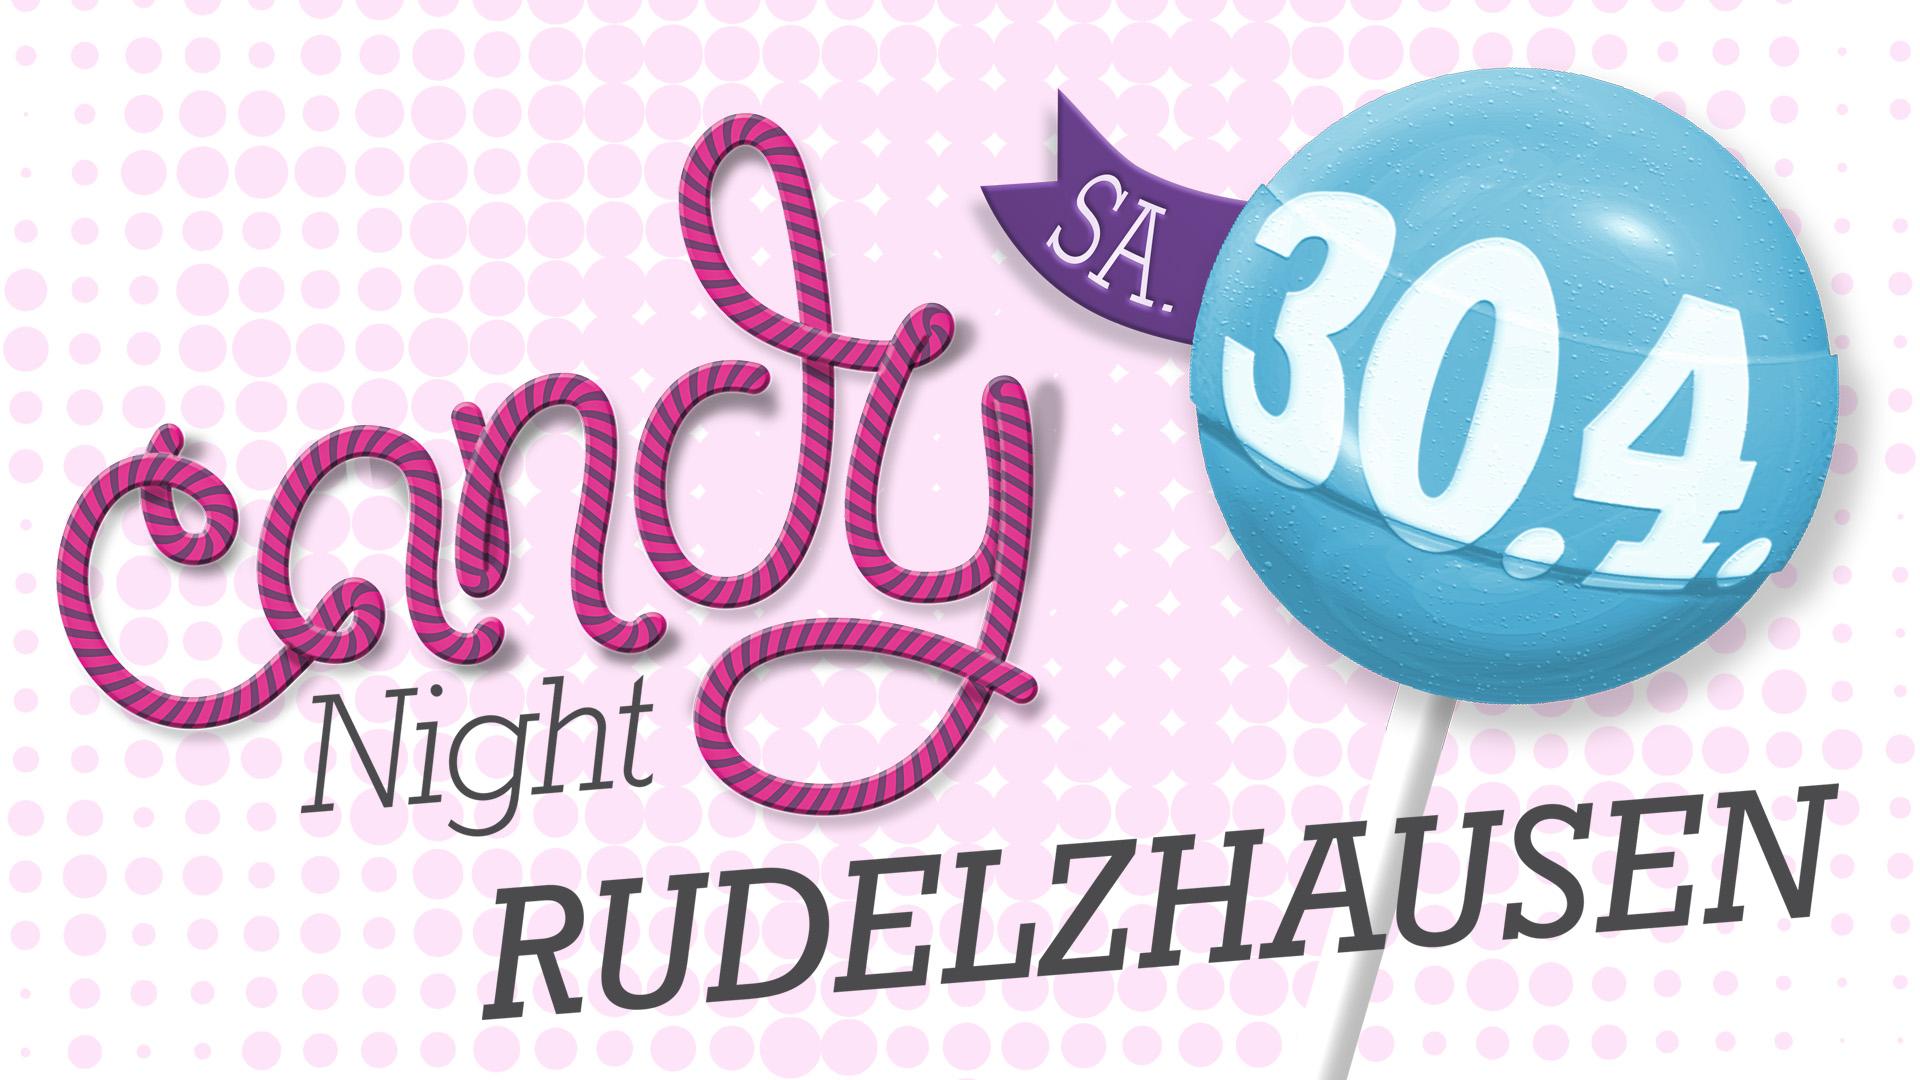 Candy Night 2014